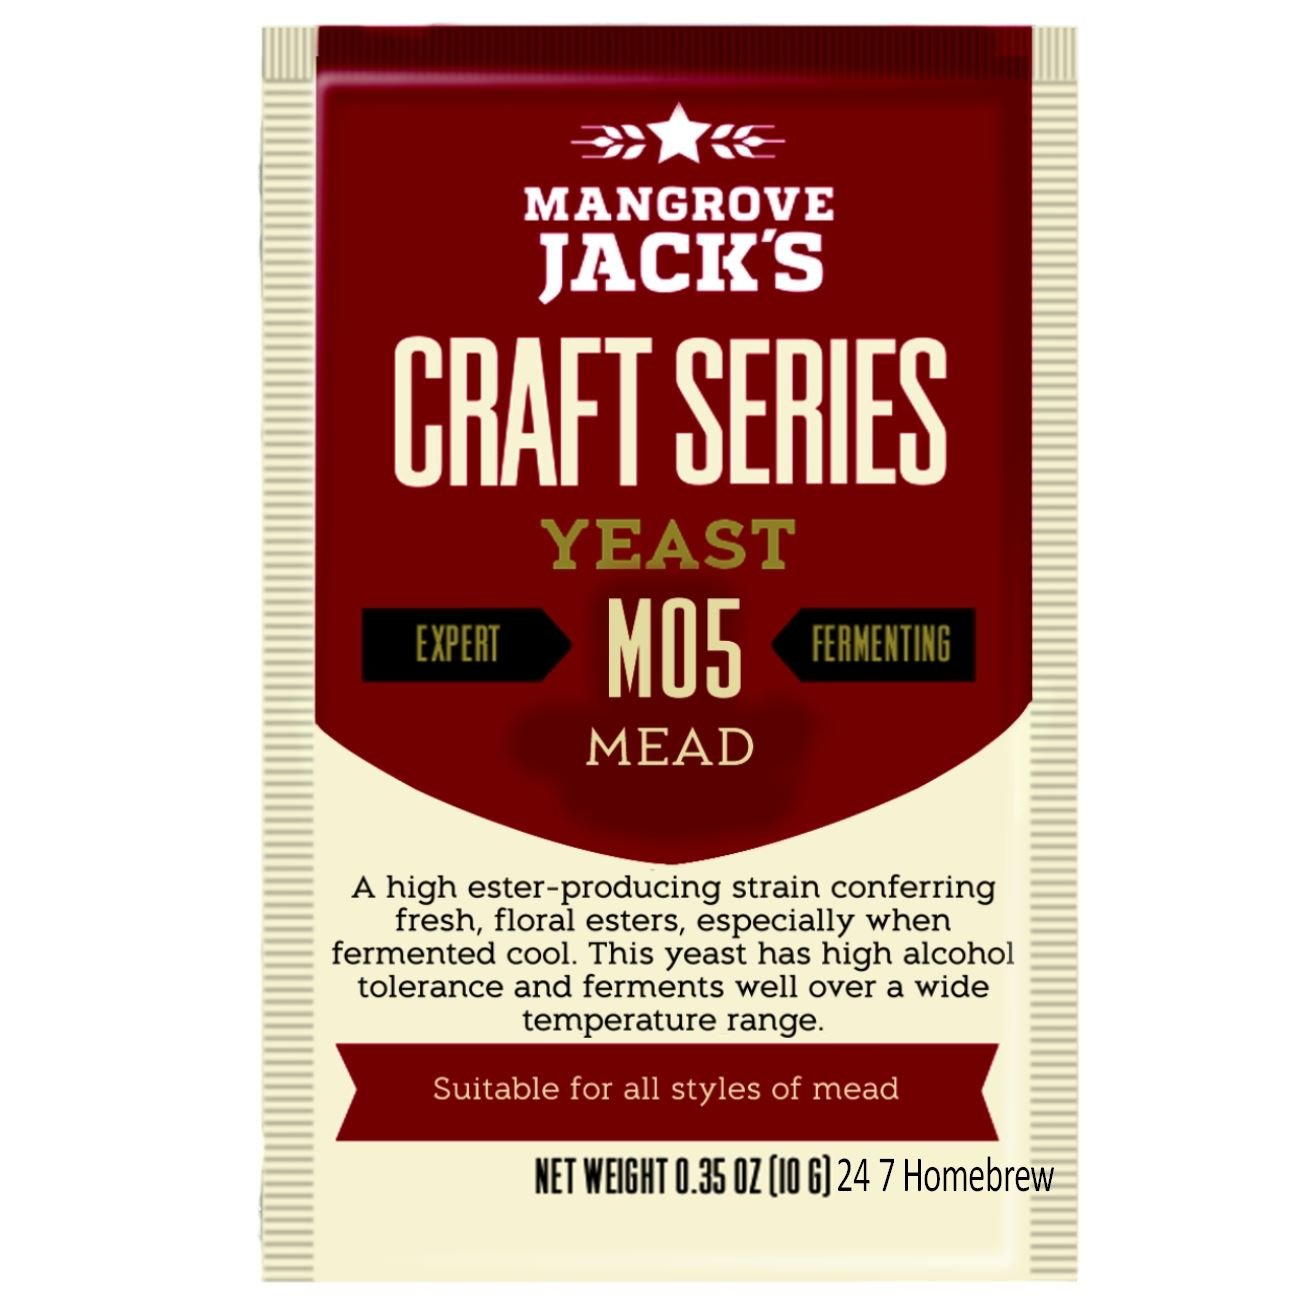 Mangrove Jack's Craft Series Mead Yeast M05 (10g) by Mangrove Jack mangovesjack